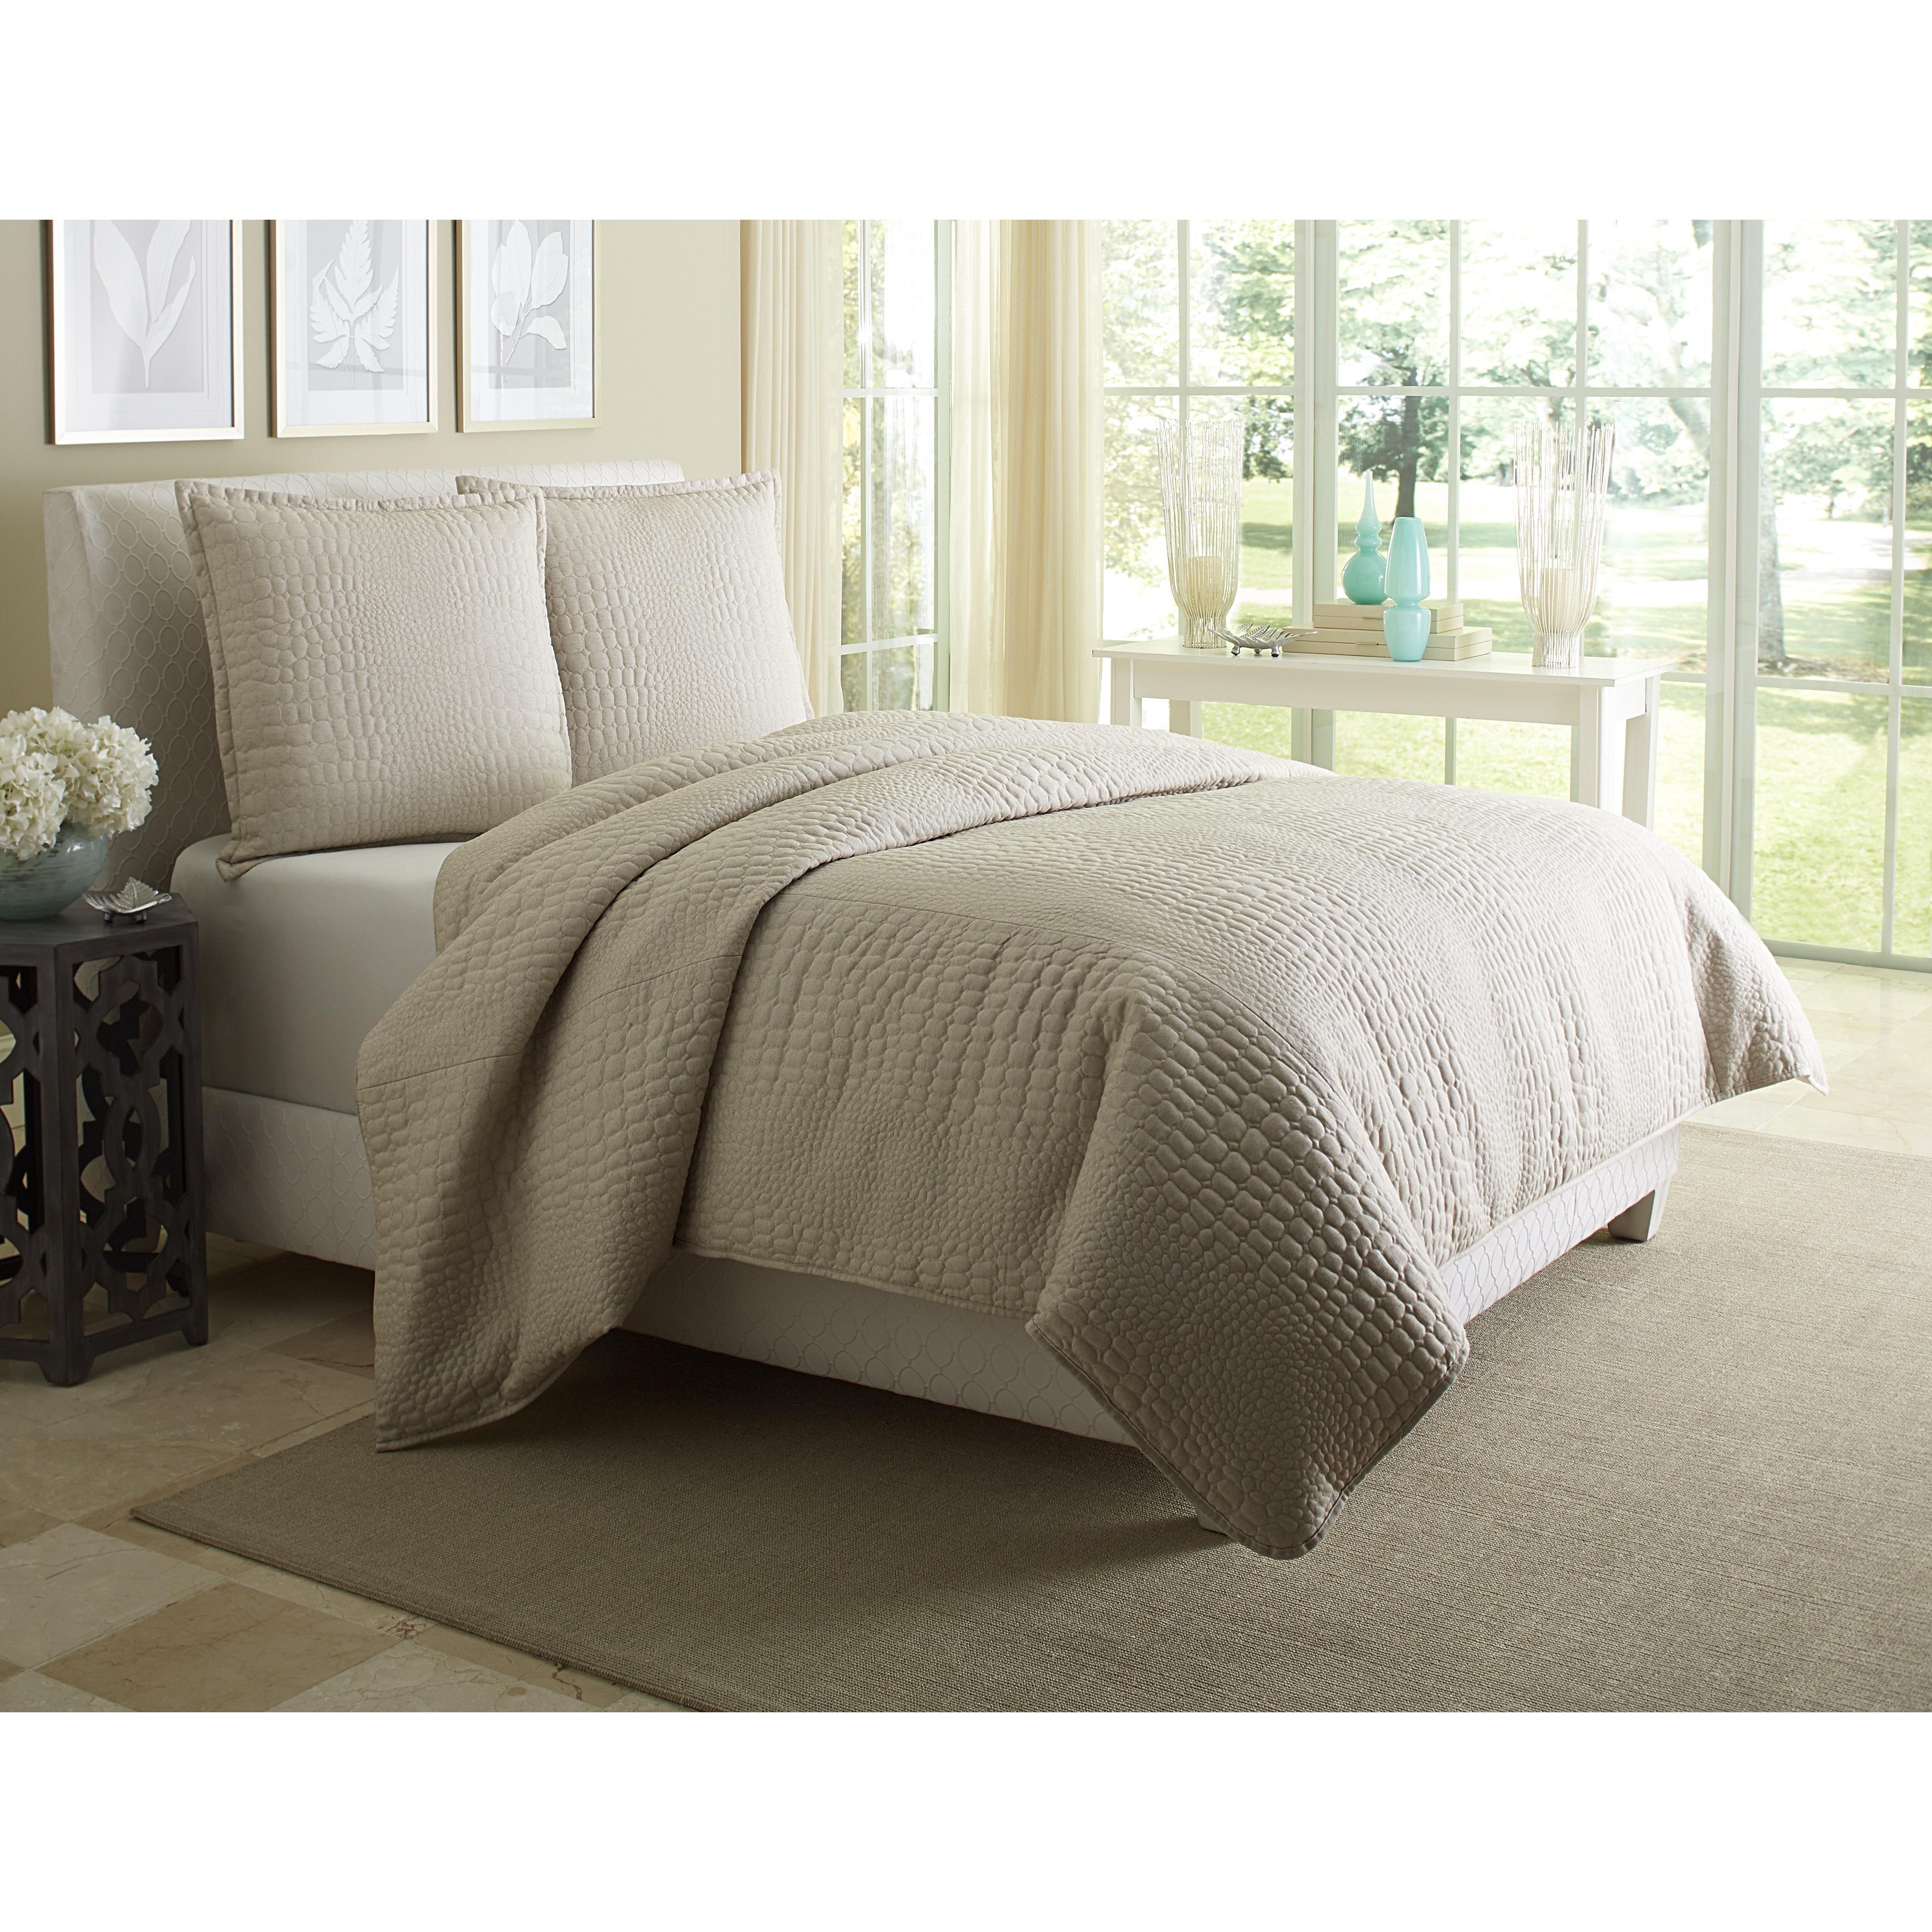 king image piece michael unusual elizabeth com size aqua bed full of sets luxury bedding bedroom quilt queen concept comforter amini amazon covers